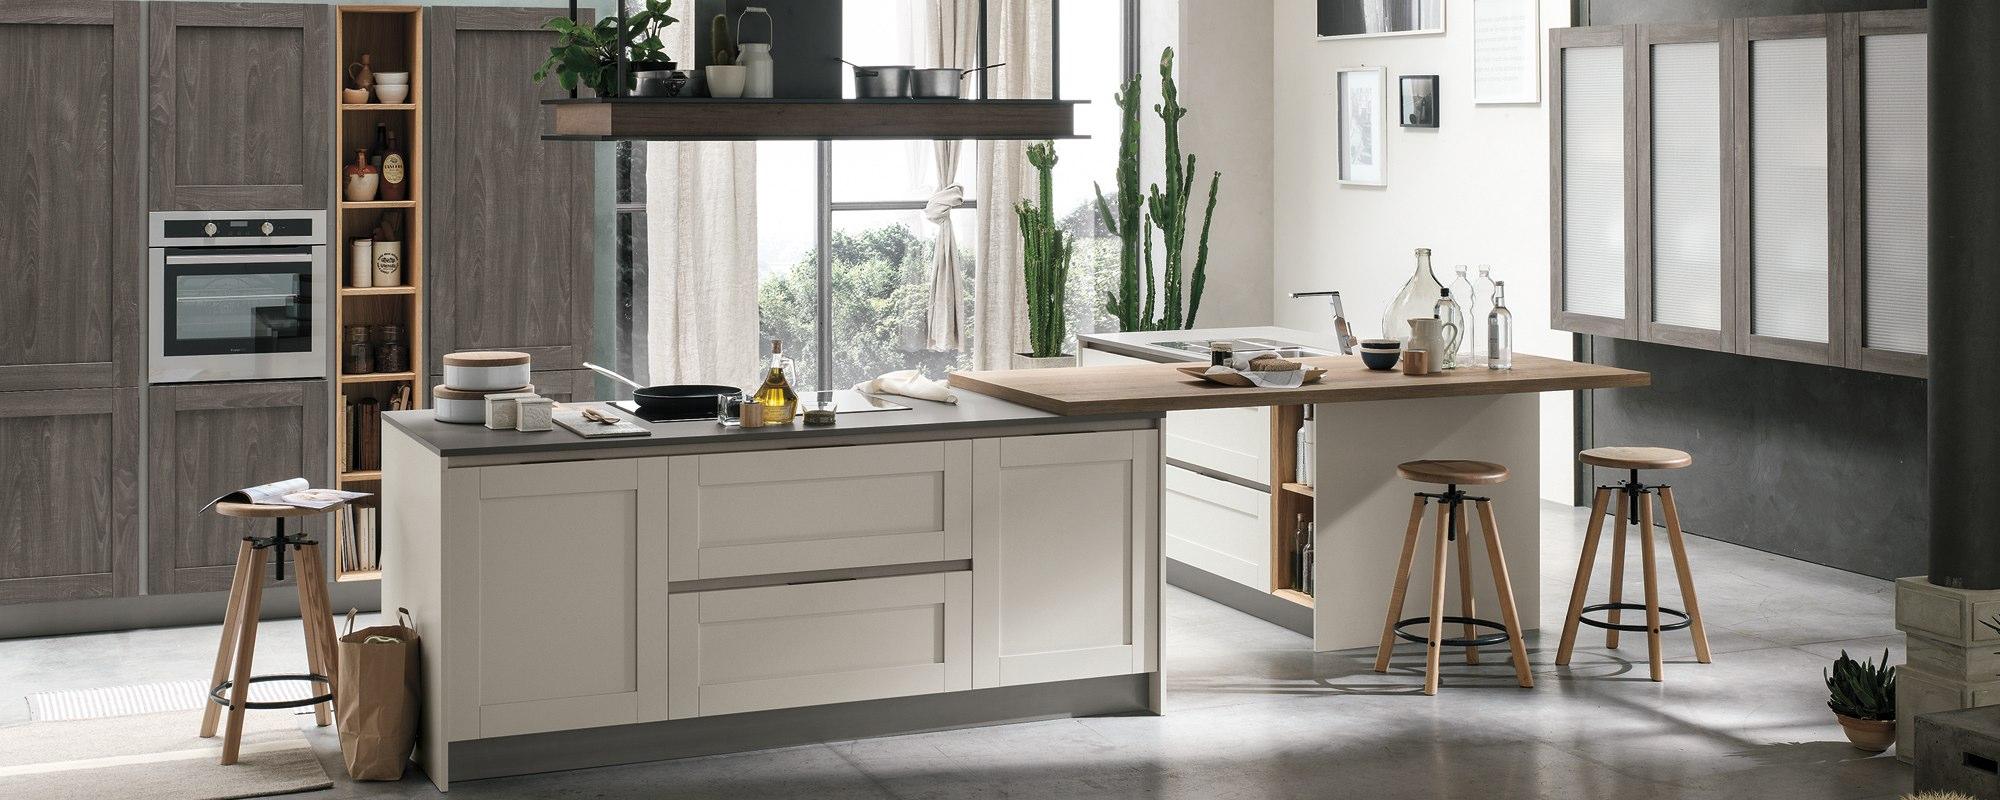 stosa-cucine-moderne-city-276 – Nasini Arredamenti